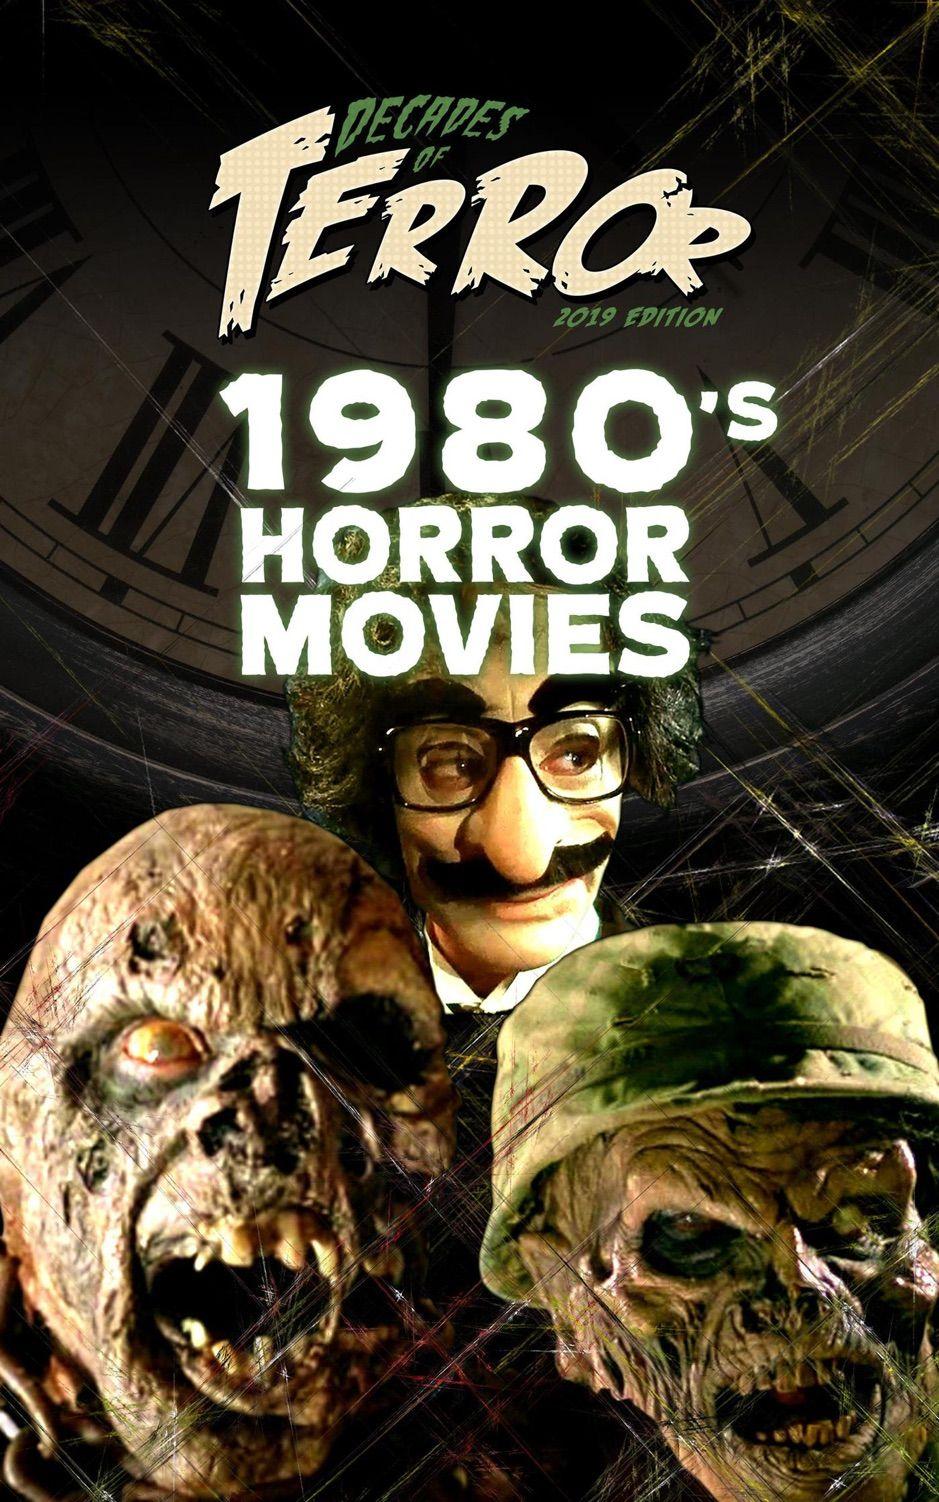 Decades of Terror 2019 1980's Horror Movies ,